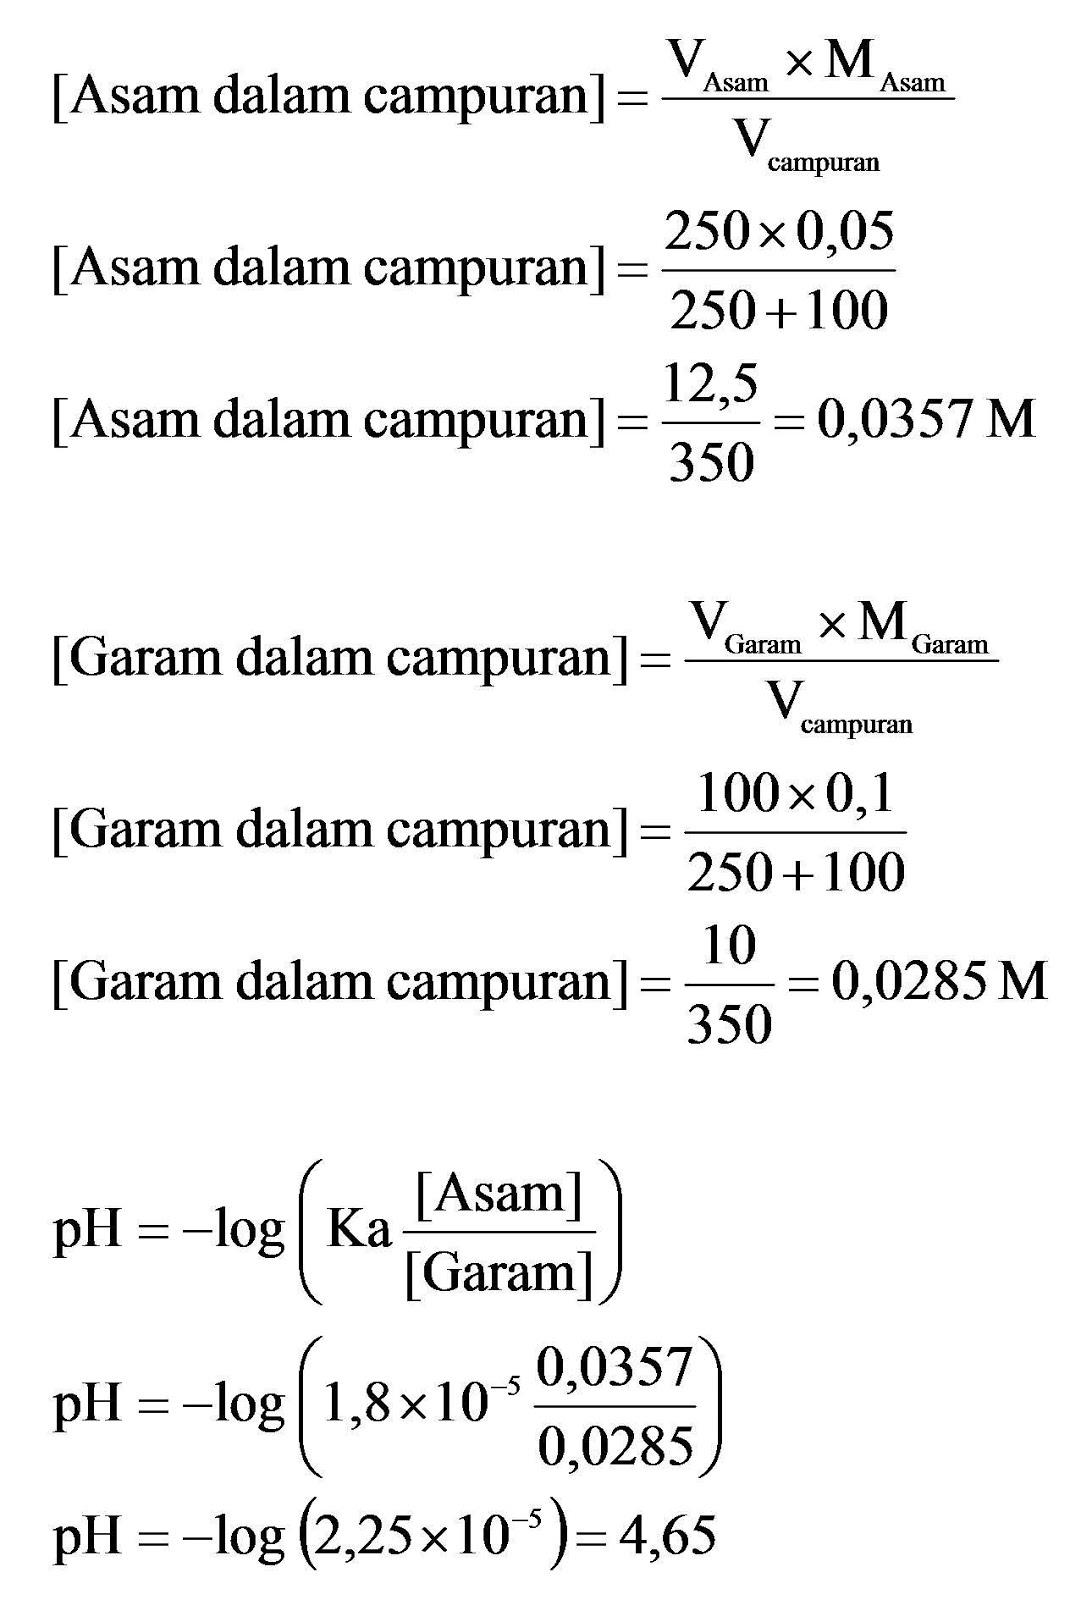 Cara Menghitung pH Larutan Asam, Basa, Garam Beserta Contoh Soal dan Pembahasan - Asymmetrical Life